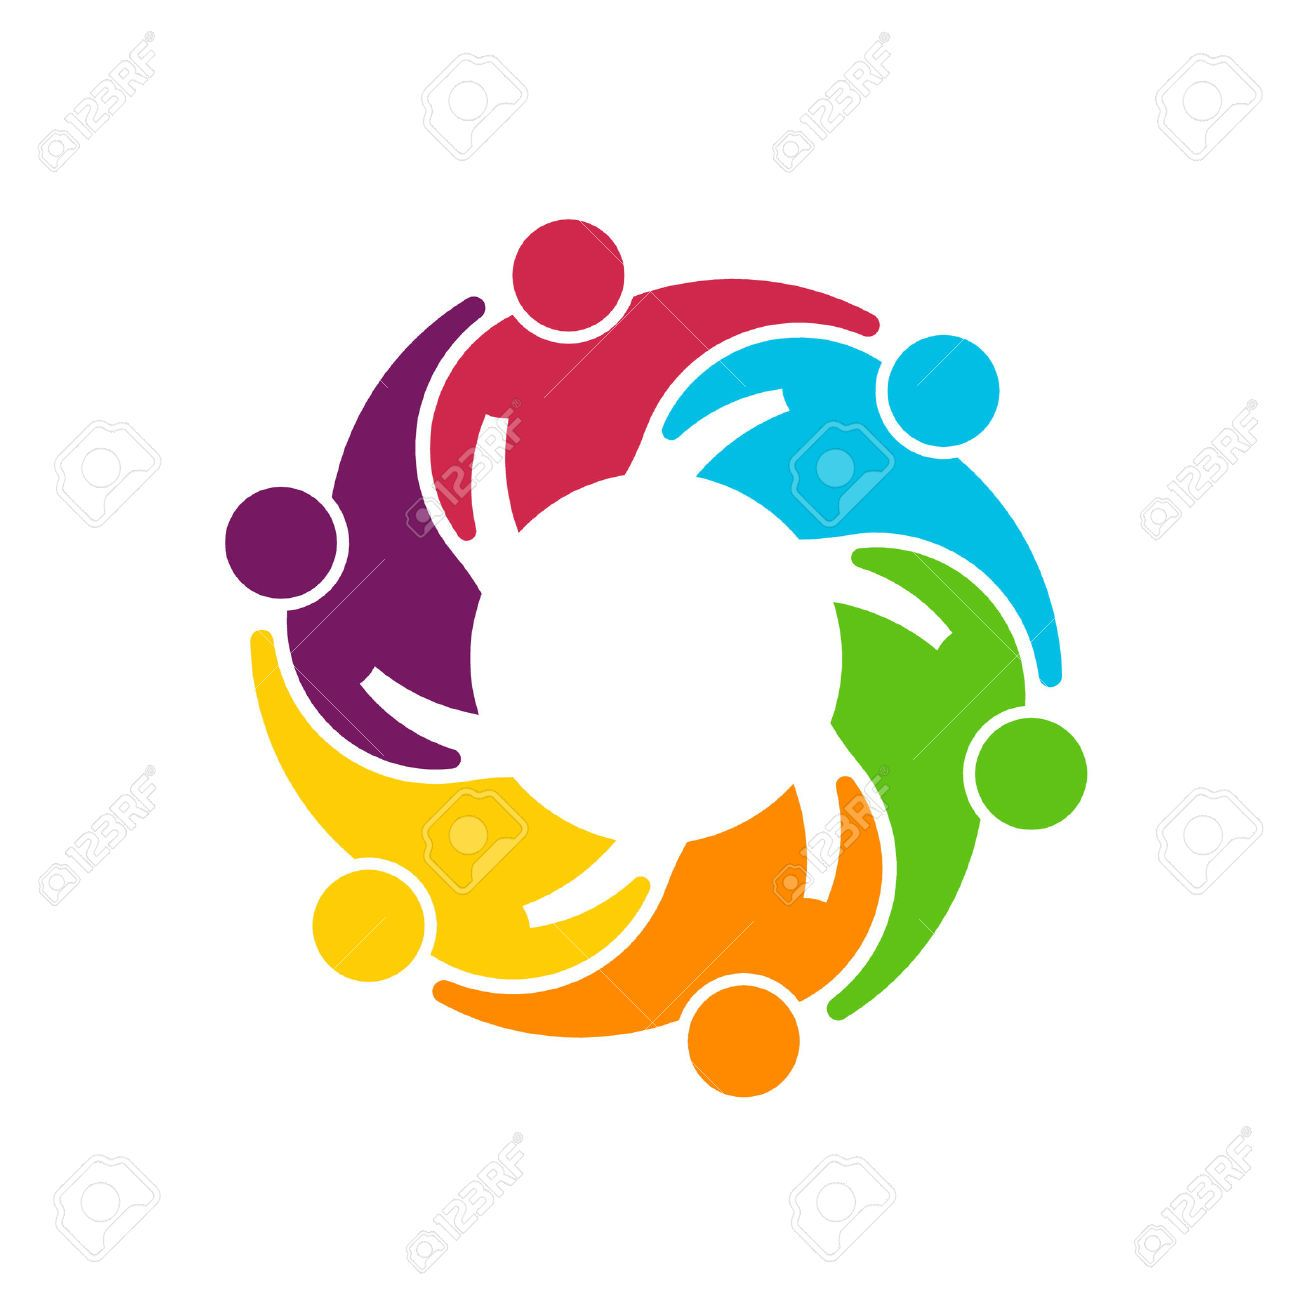 Get together logo clipart vector free hands together: Teamwork Gear | diseño de líneas | People hugging ... vector free